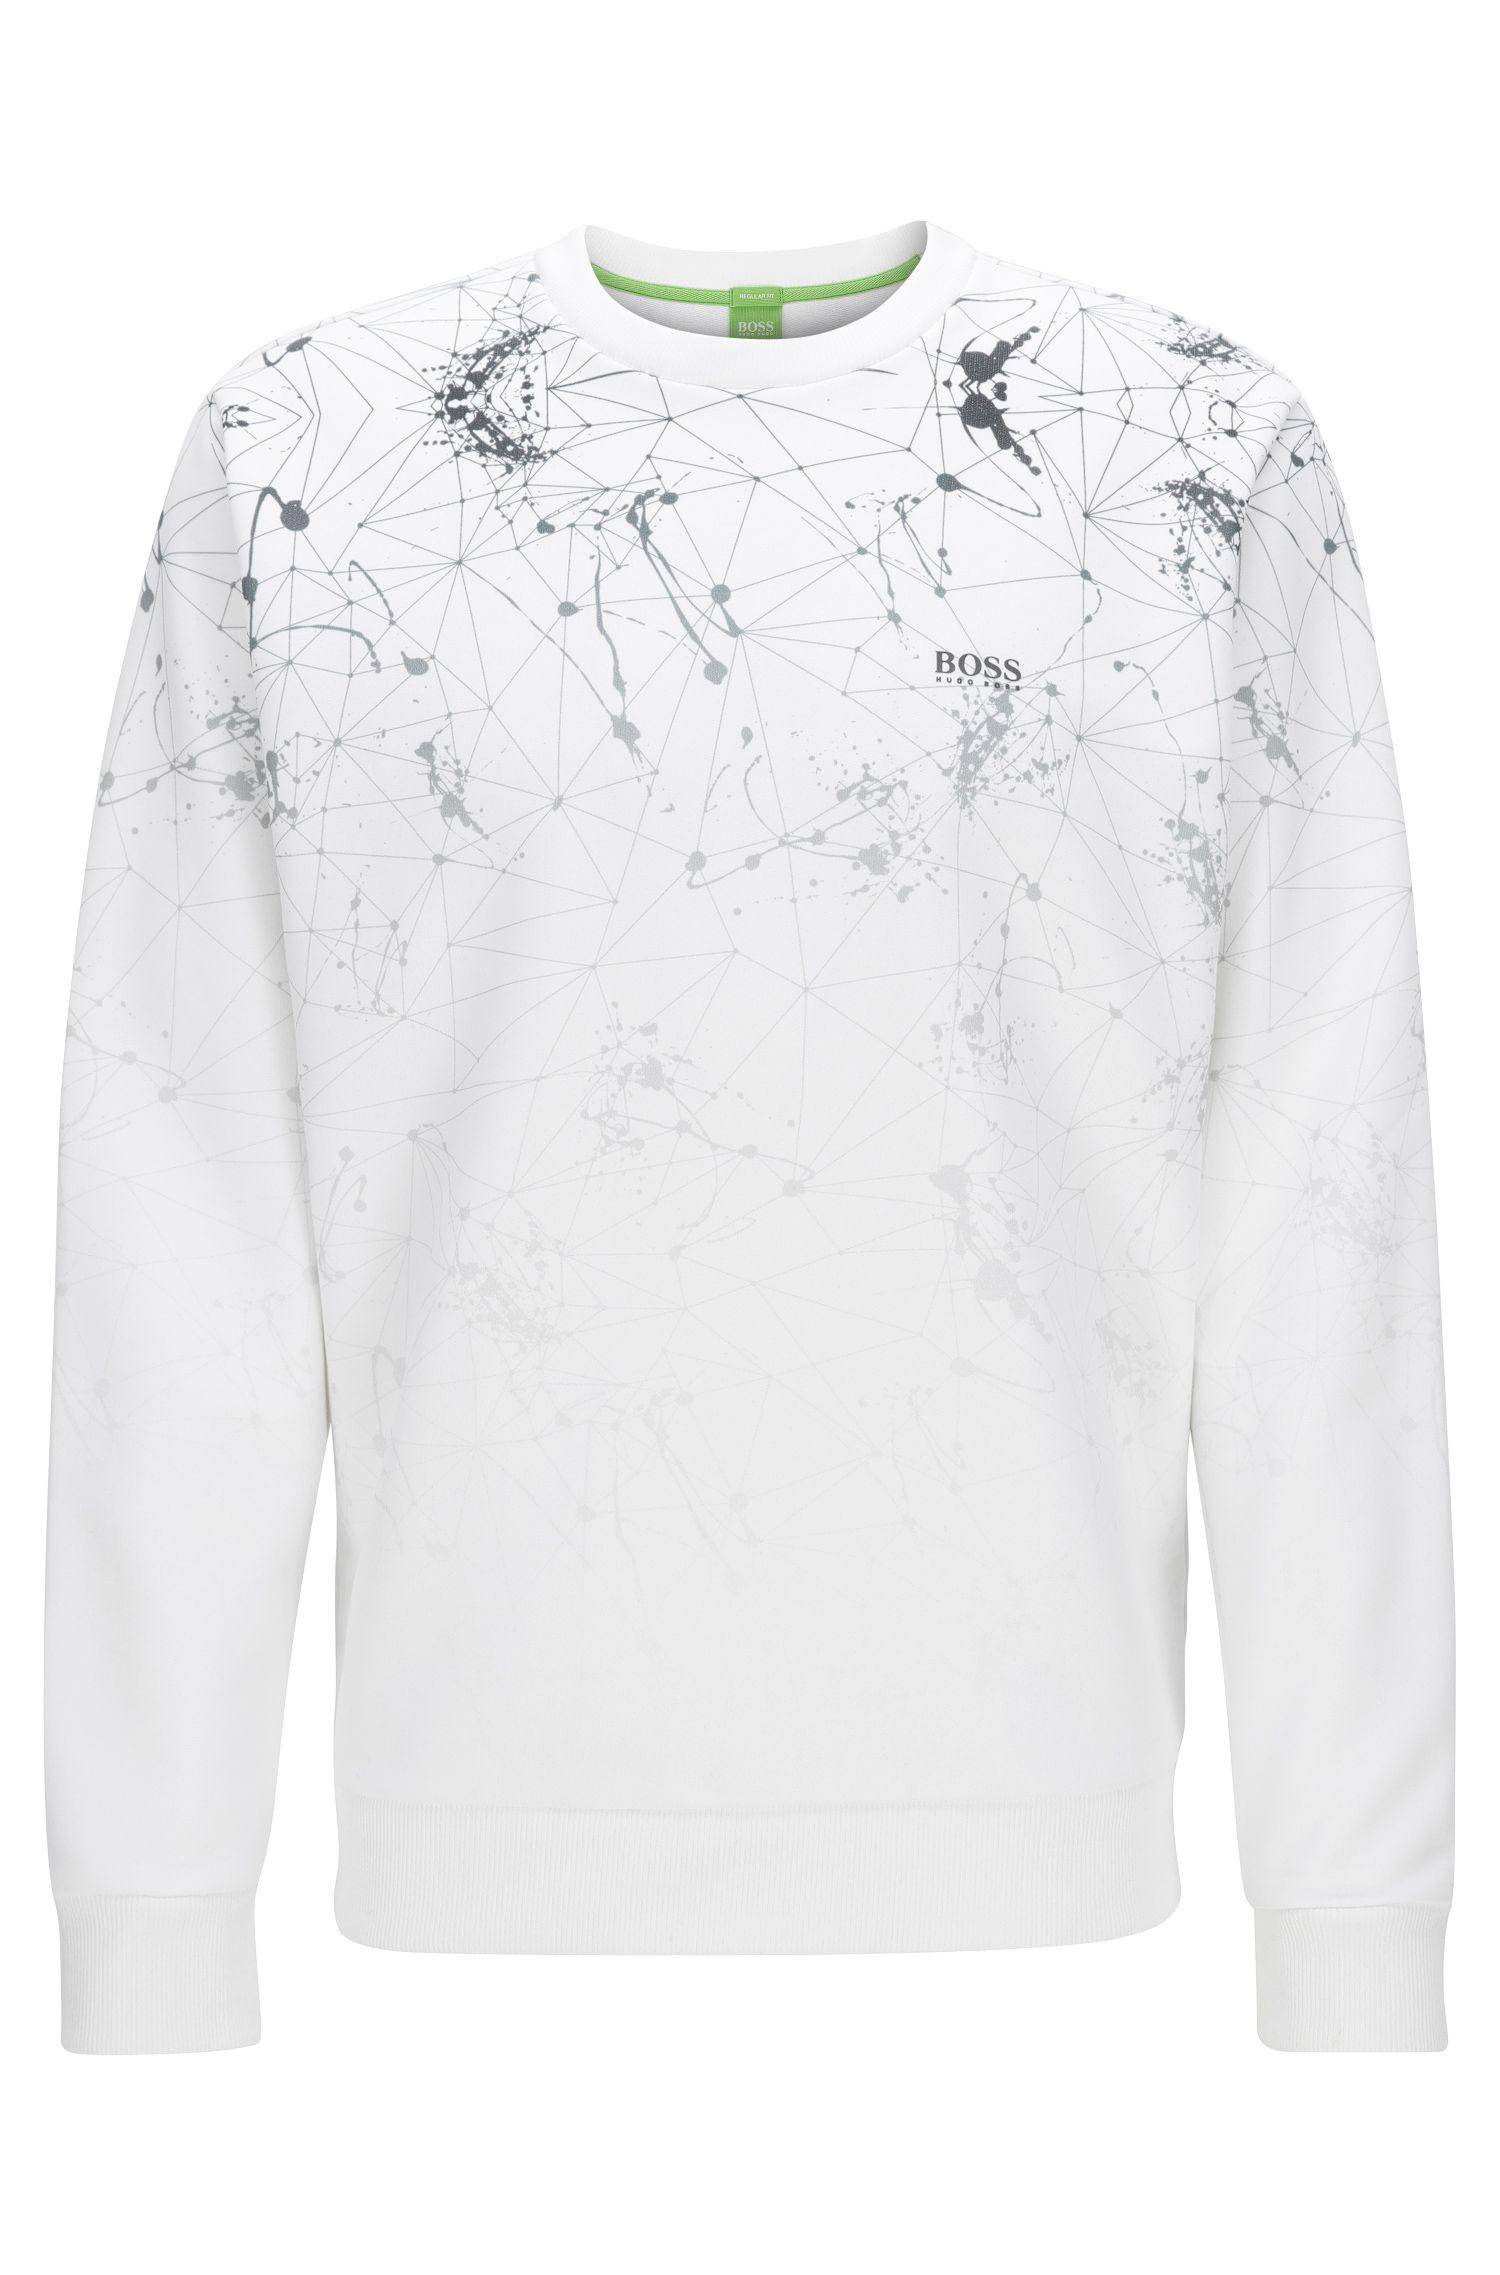 Stretch Cotton Sweatshirt | Swelock